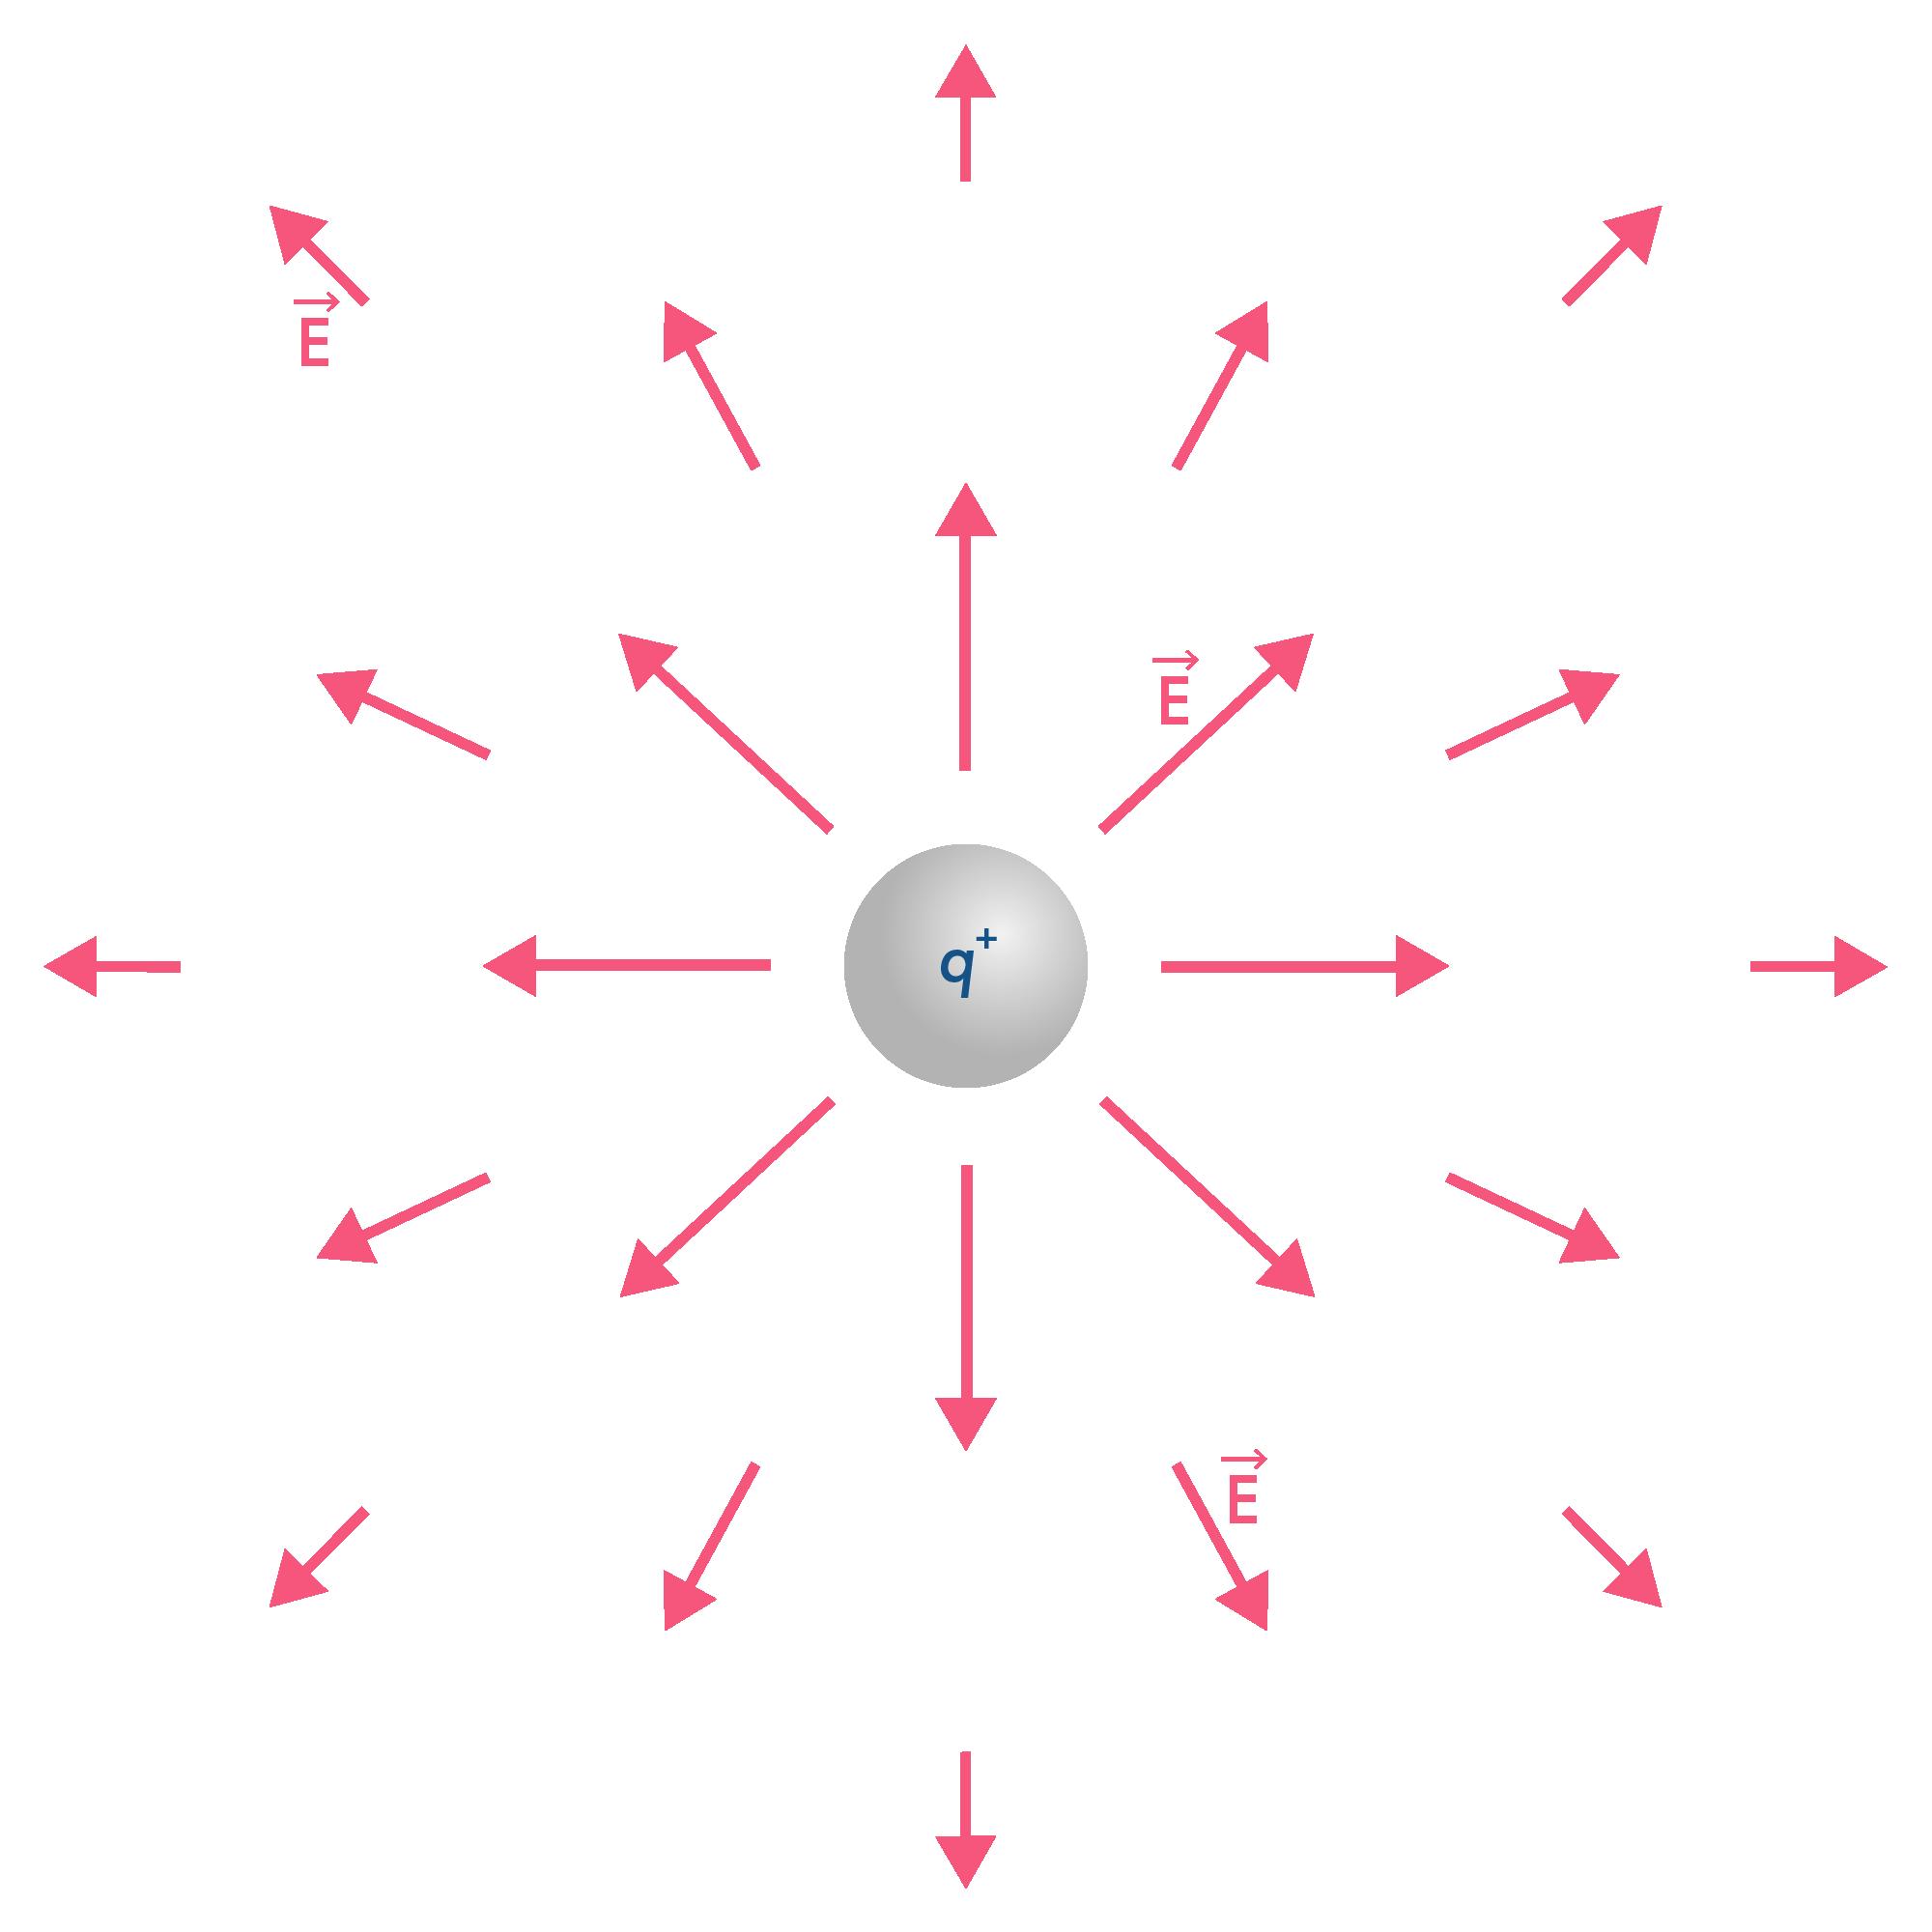 Champ magnétique centrifuge